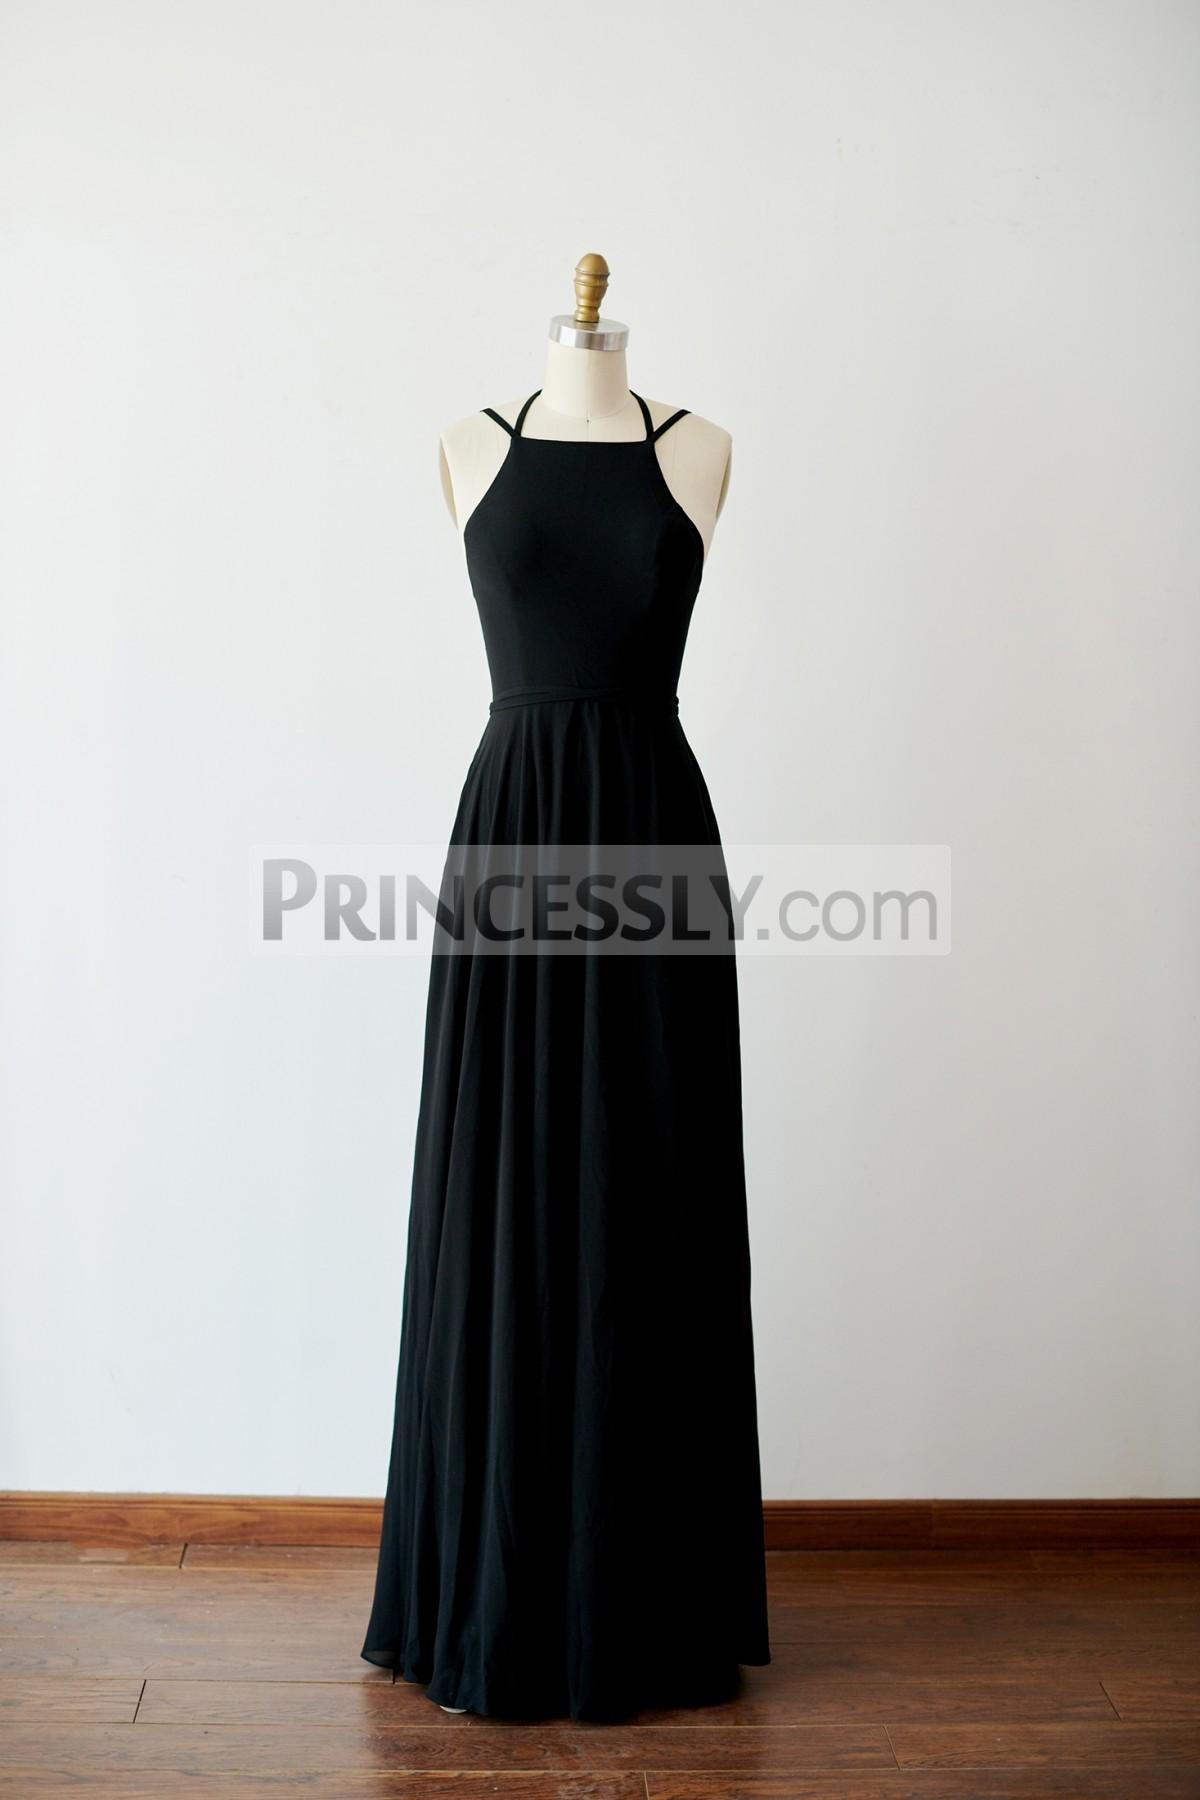 Princessly.com-K1003819-Sexy Lace Up Black Chiffon Wedding Bridesmaid Dress Evening Party Dress-31